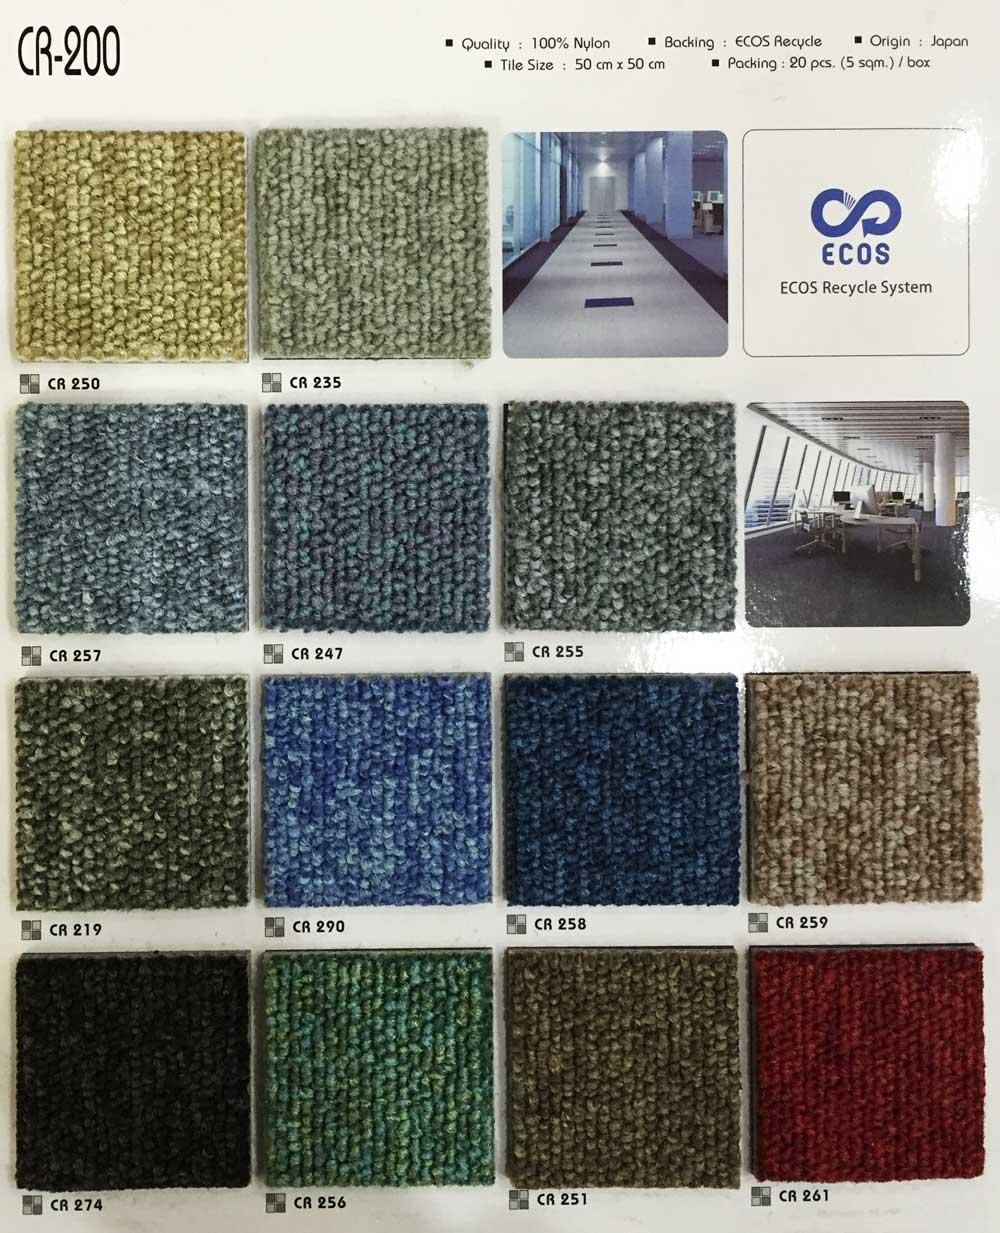 suminoe cr 200 japan pure color carpet tile collection macau